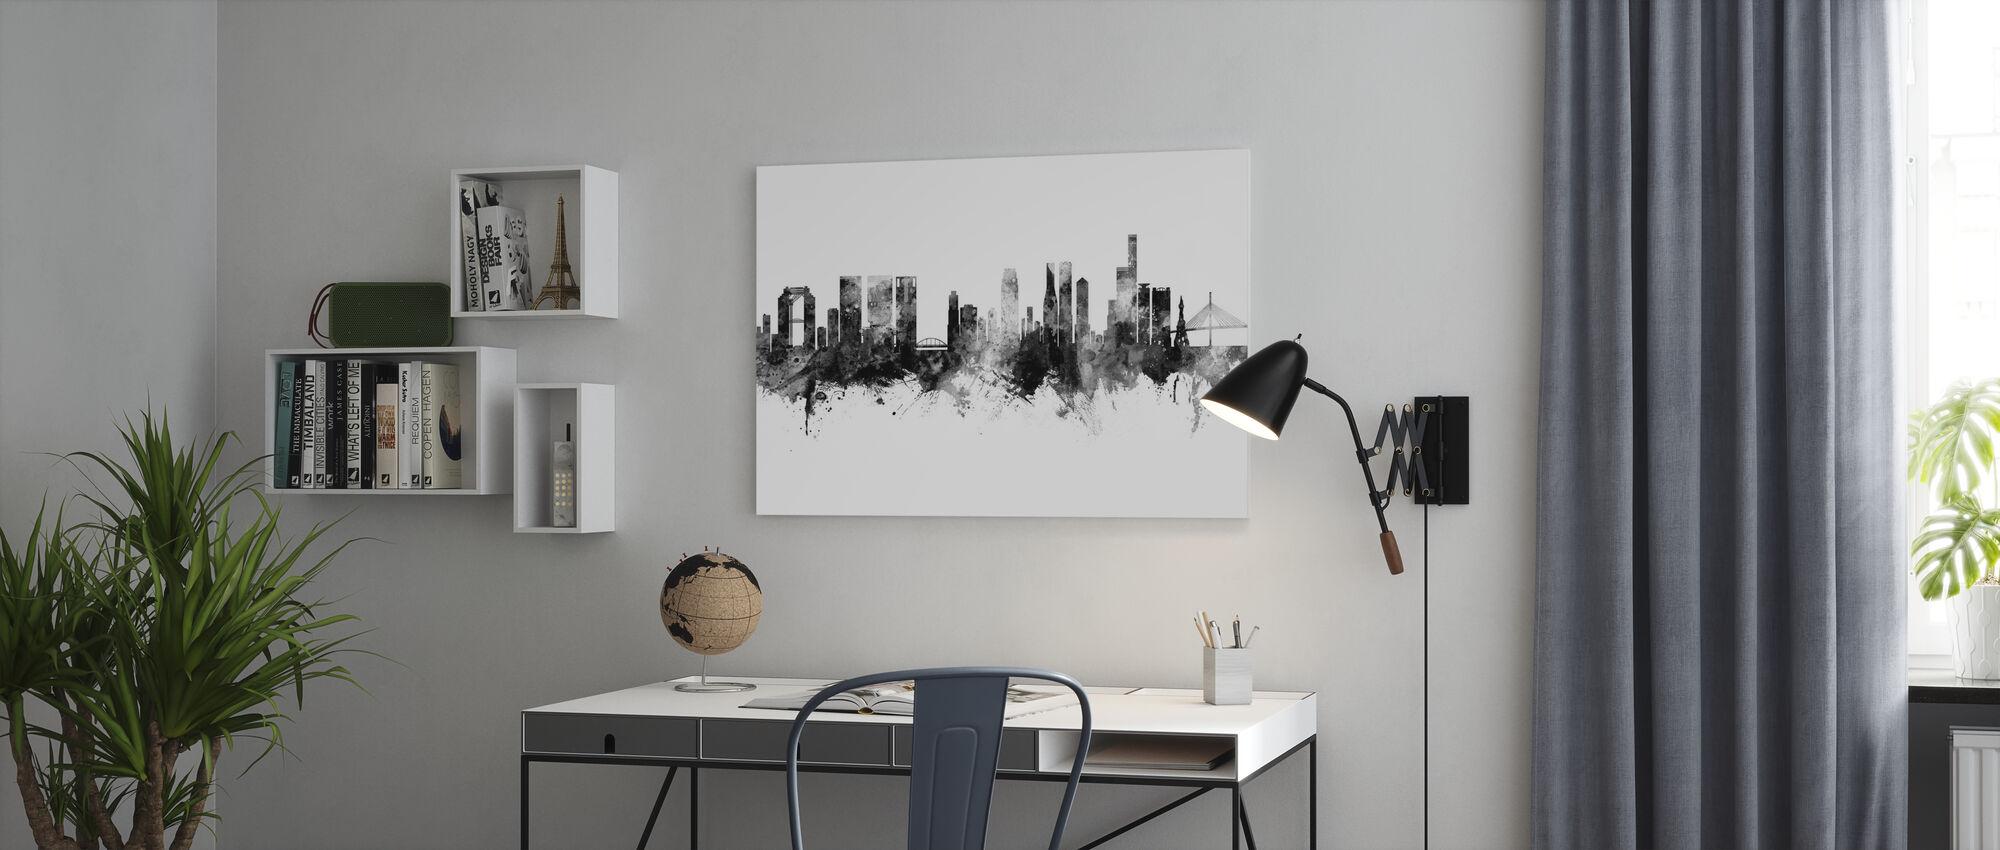 Osaka Japan Skyline - Canvas print - Office